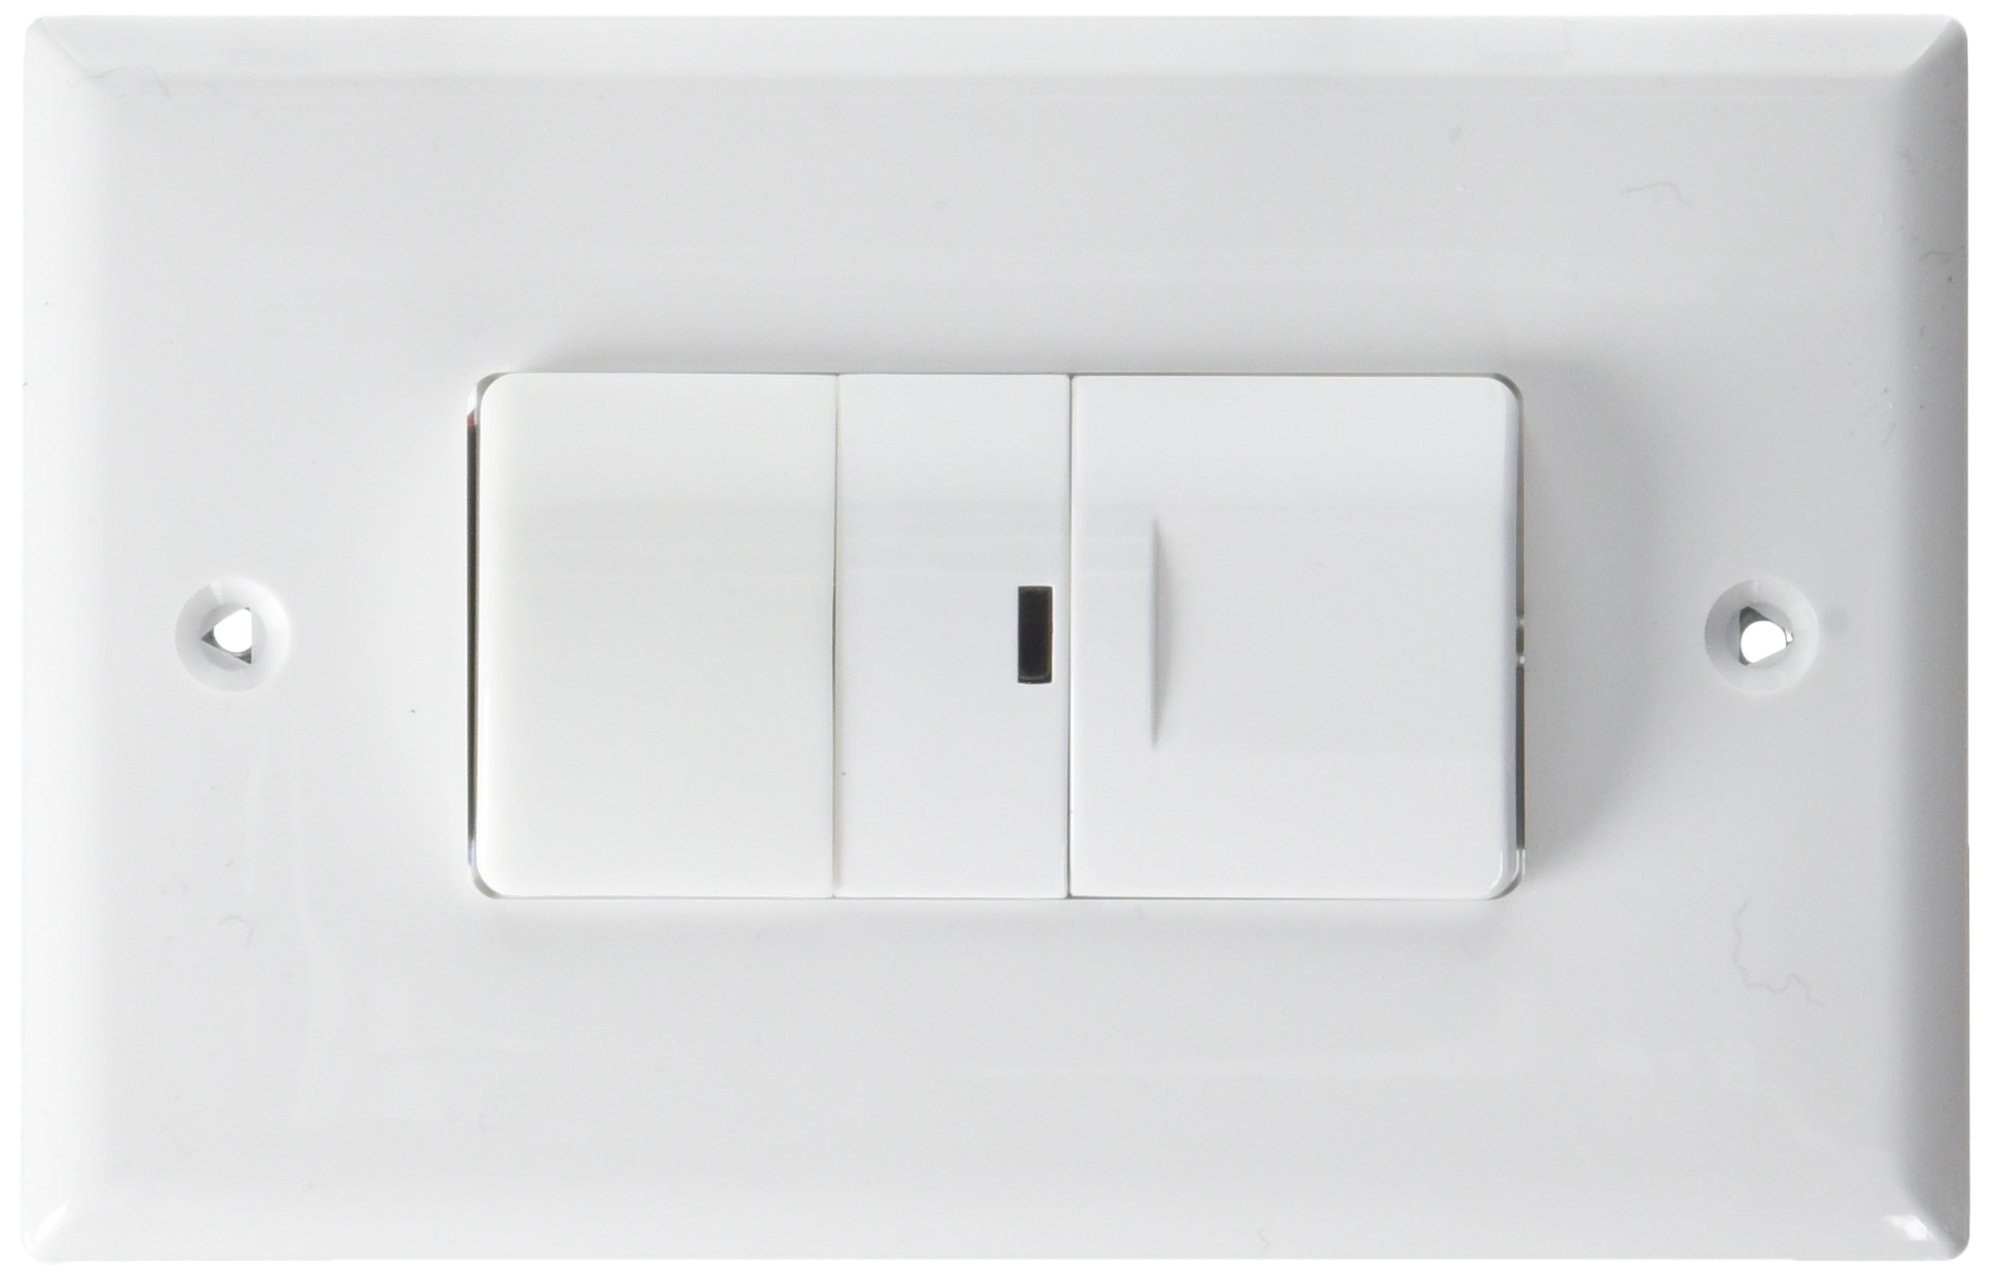 Eaton OS306U-W 600W Wall Mount Occupancy Vacancy Sensor, White